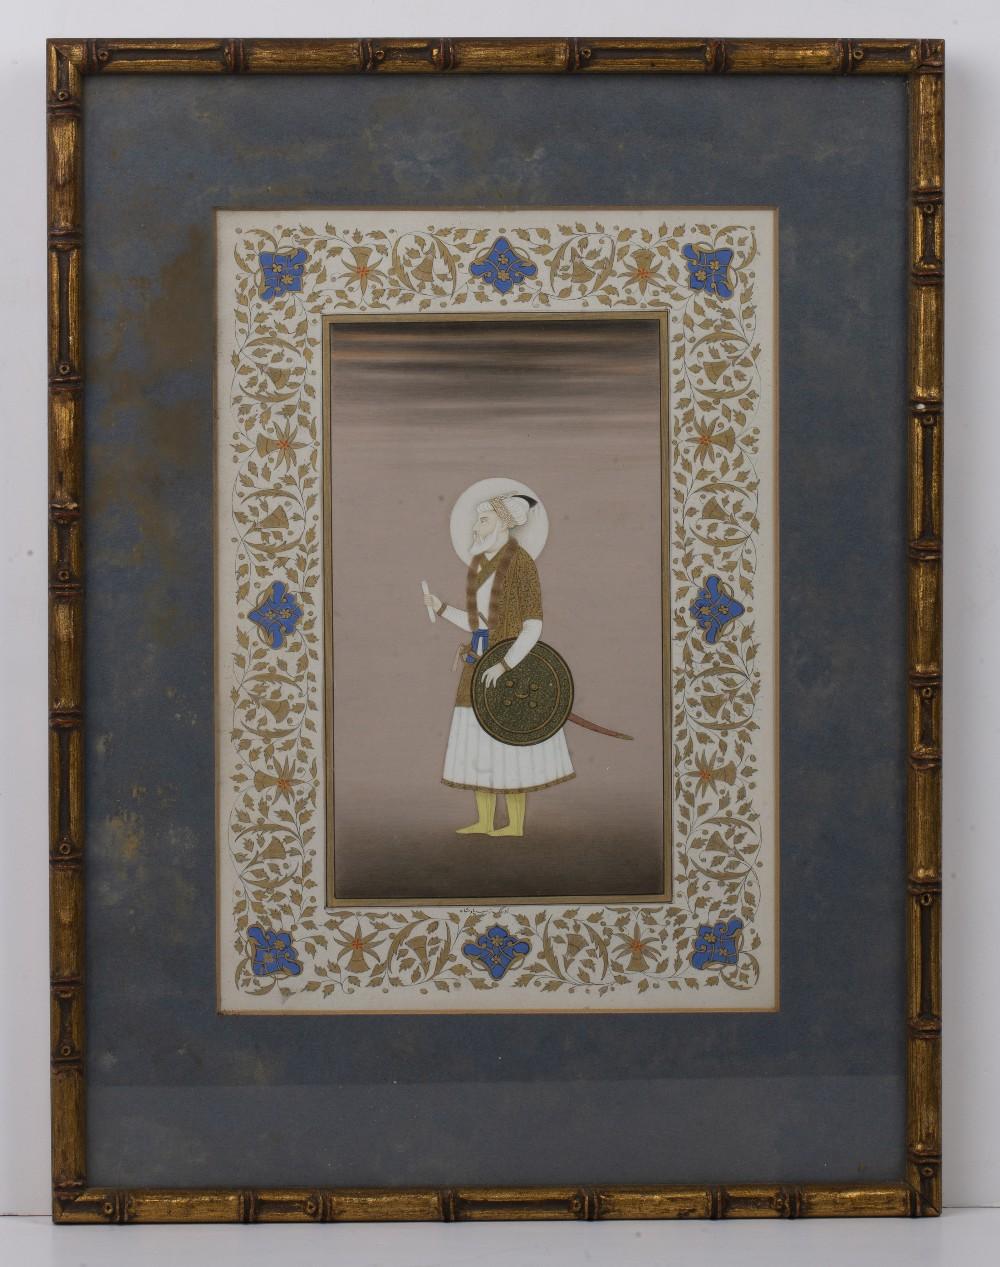 Ustad Haji Muhammad Sharif (1889-1978) 'Aurangzeb, Mughal Emperor of India' painting on paper, - Image 2 of 3